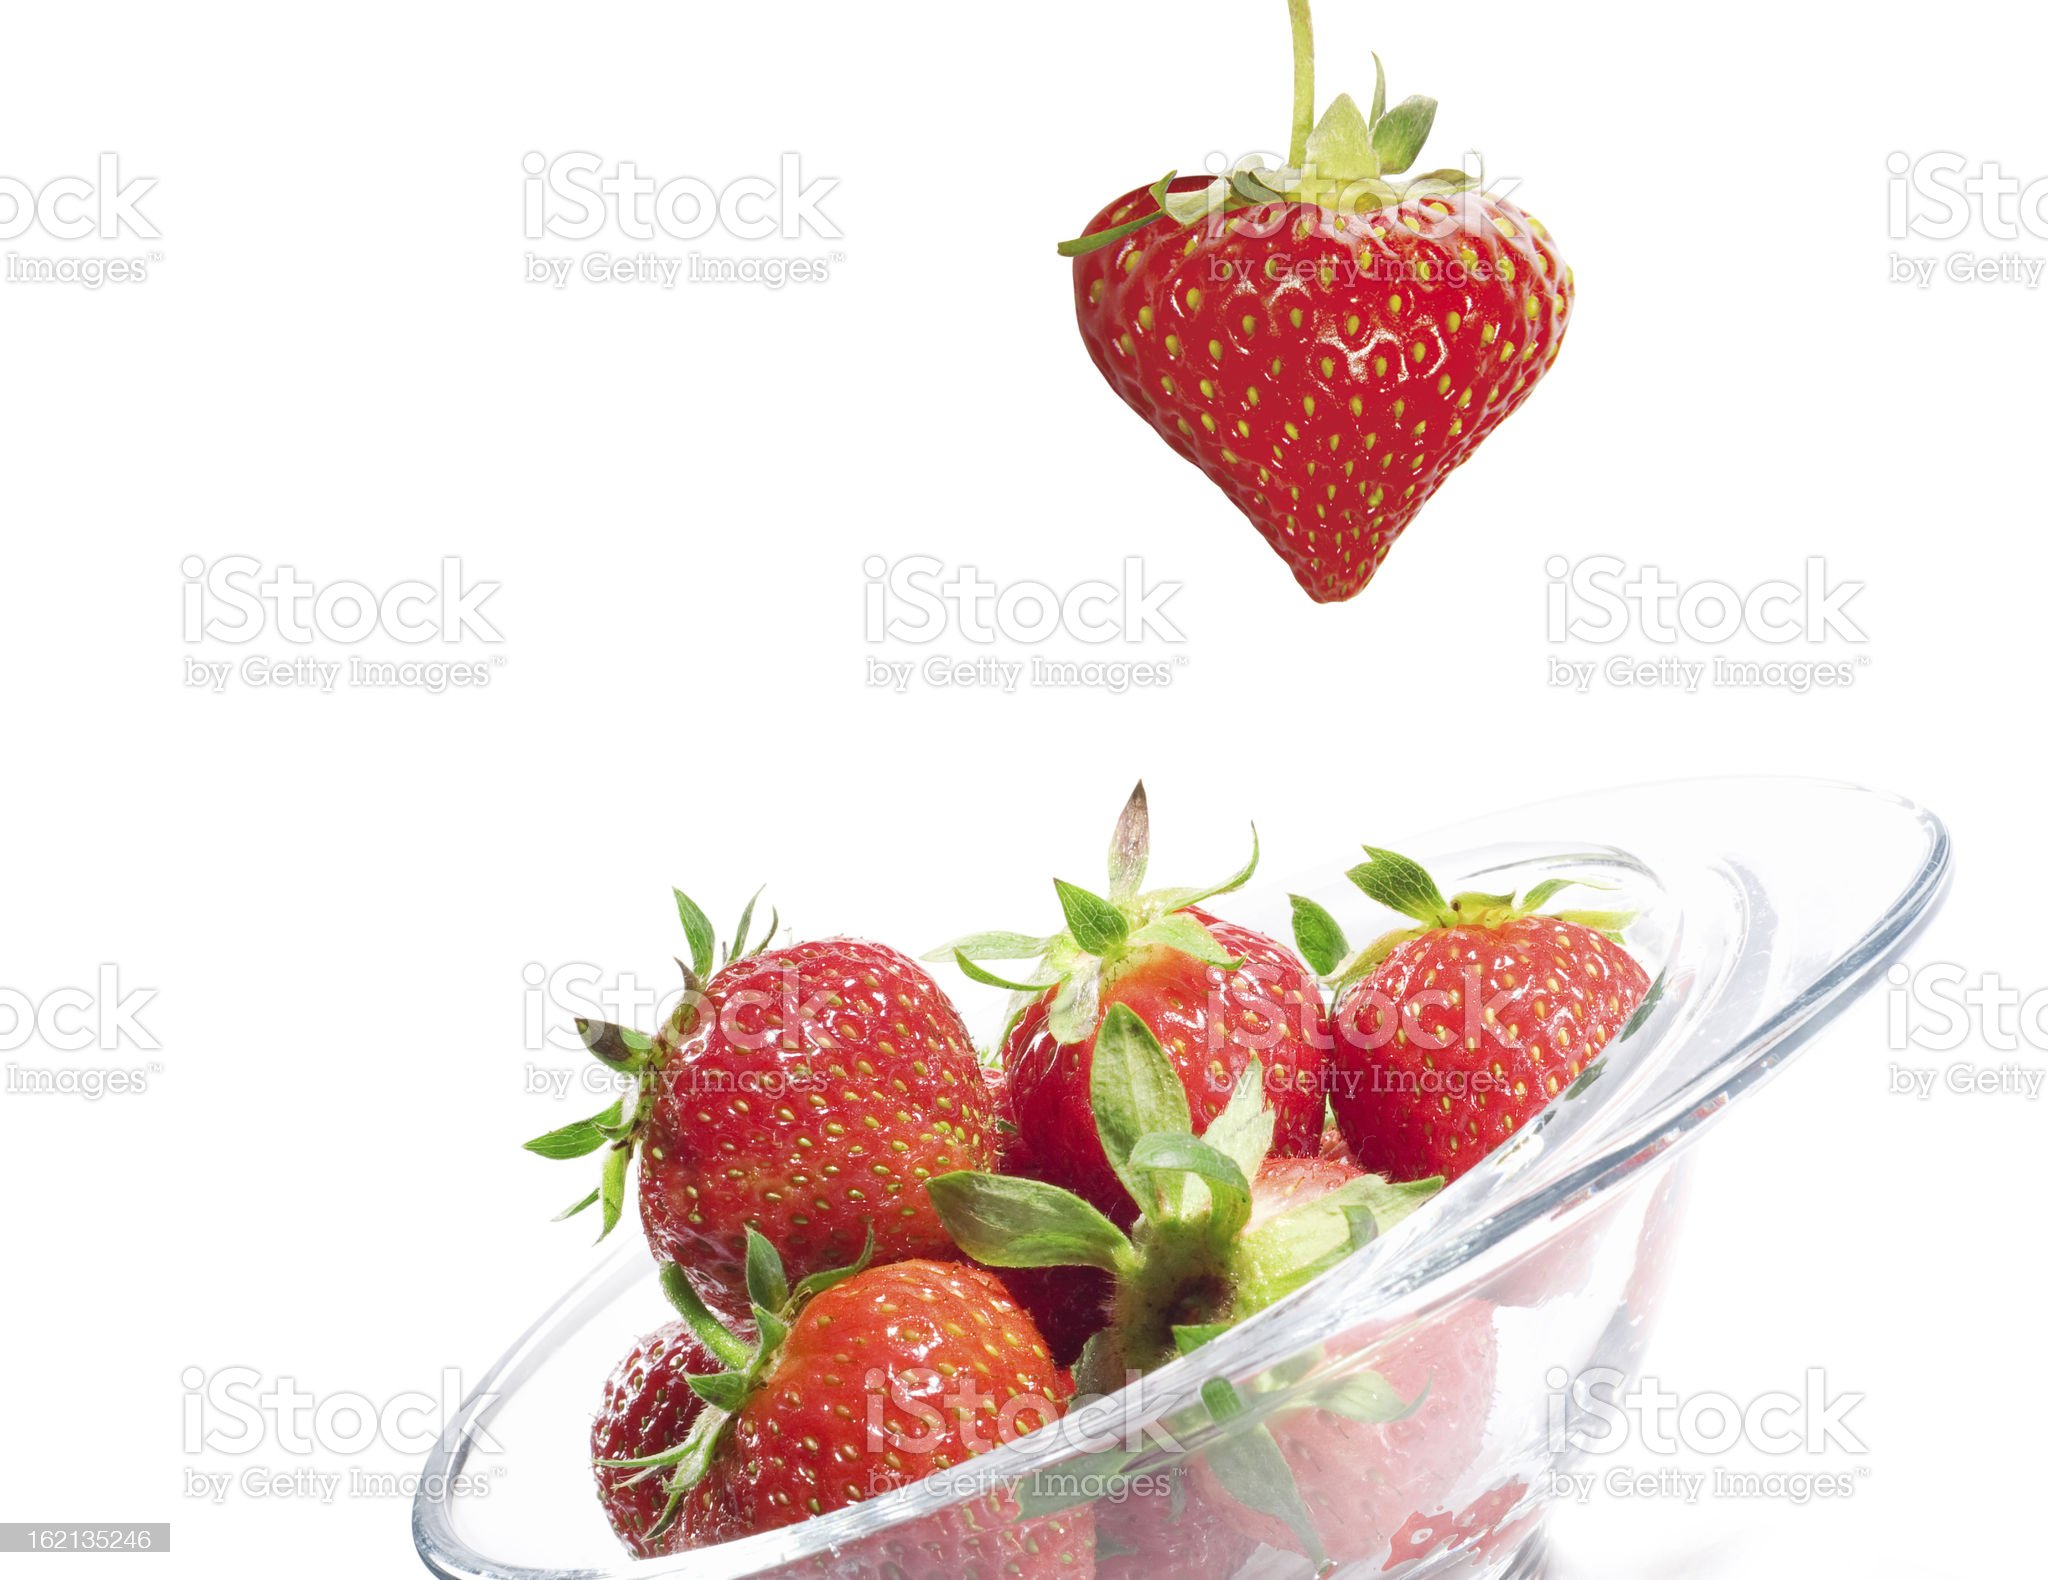 Strawberry Valentine's heart royalty-free stock photo